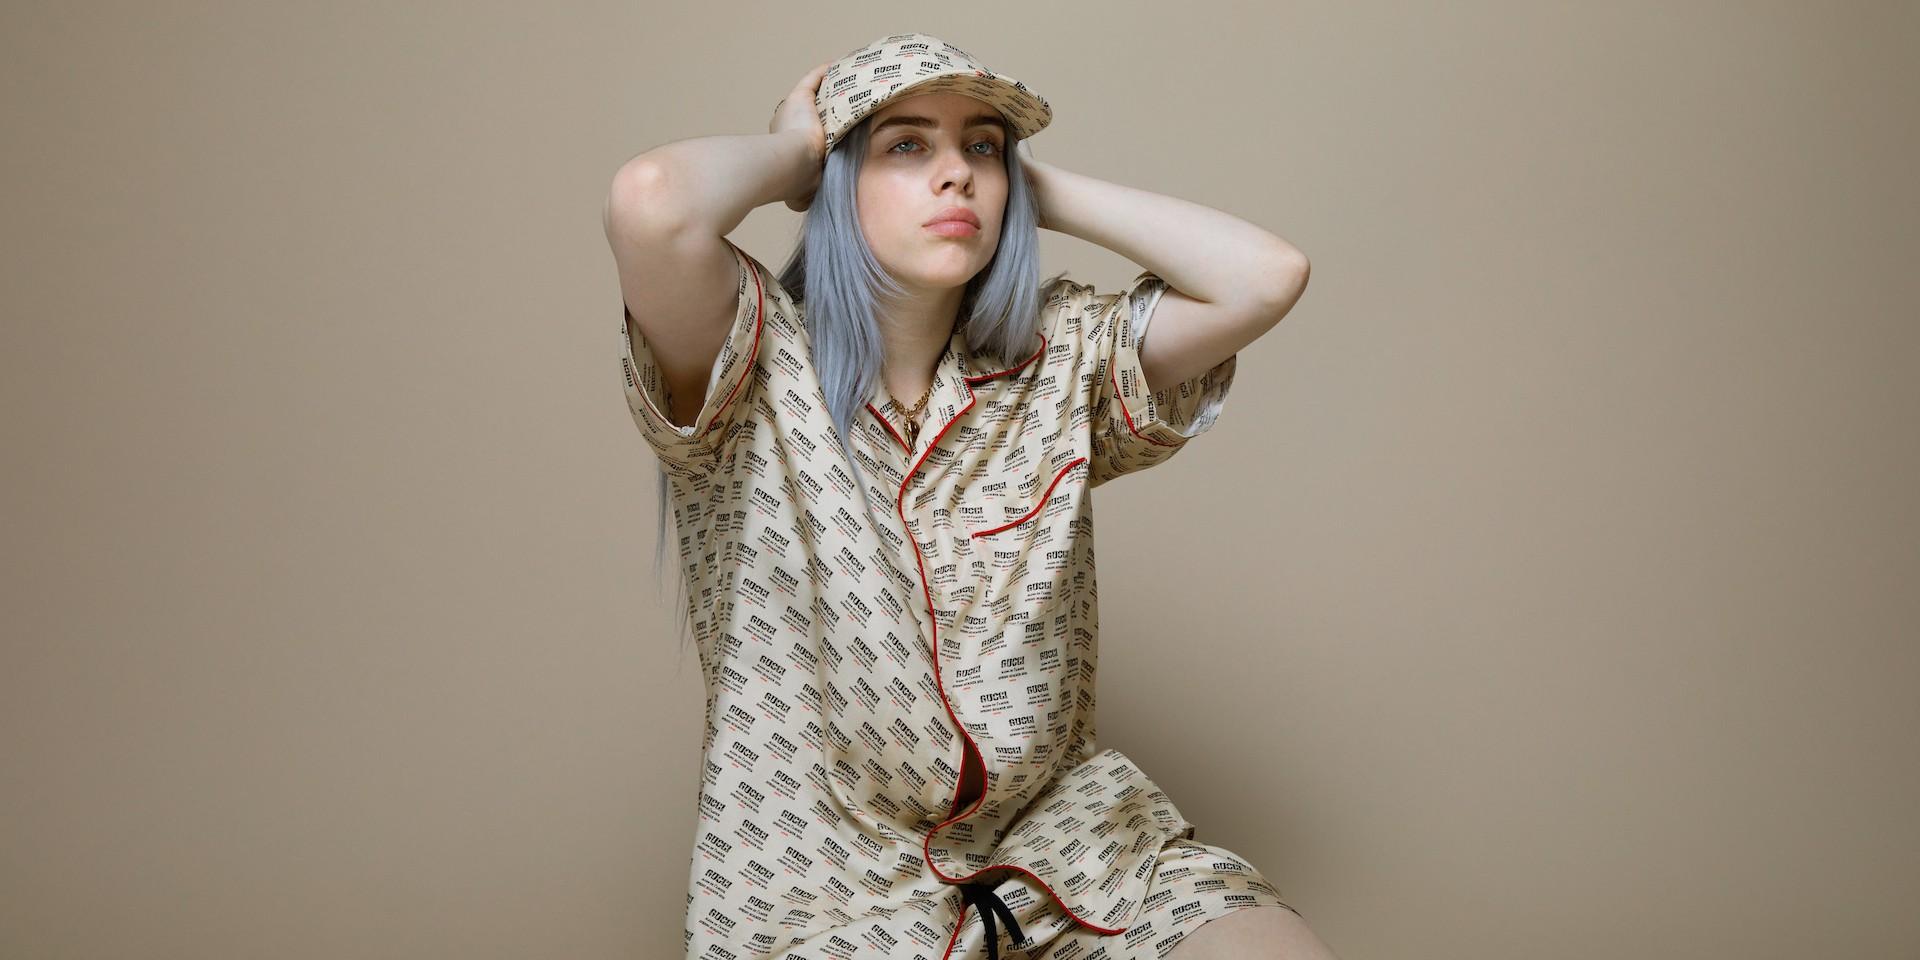 Billie Eilish releases debut album, WHEN WE FALL ASLEEP, WHERE DO WE GO? – listen